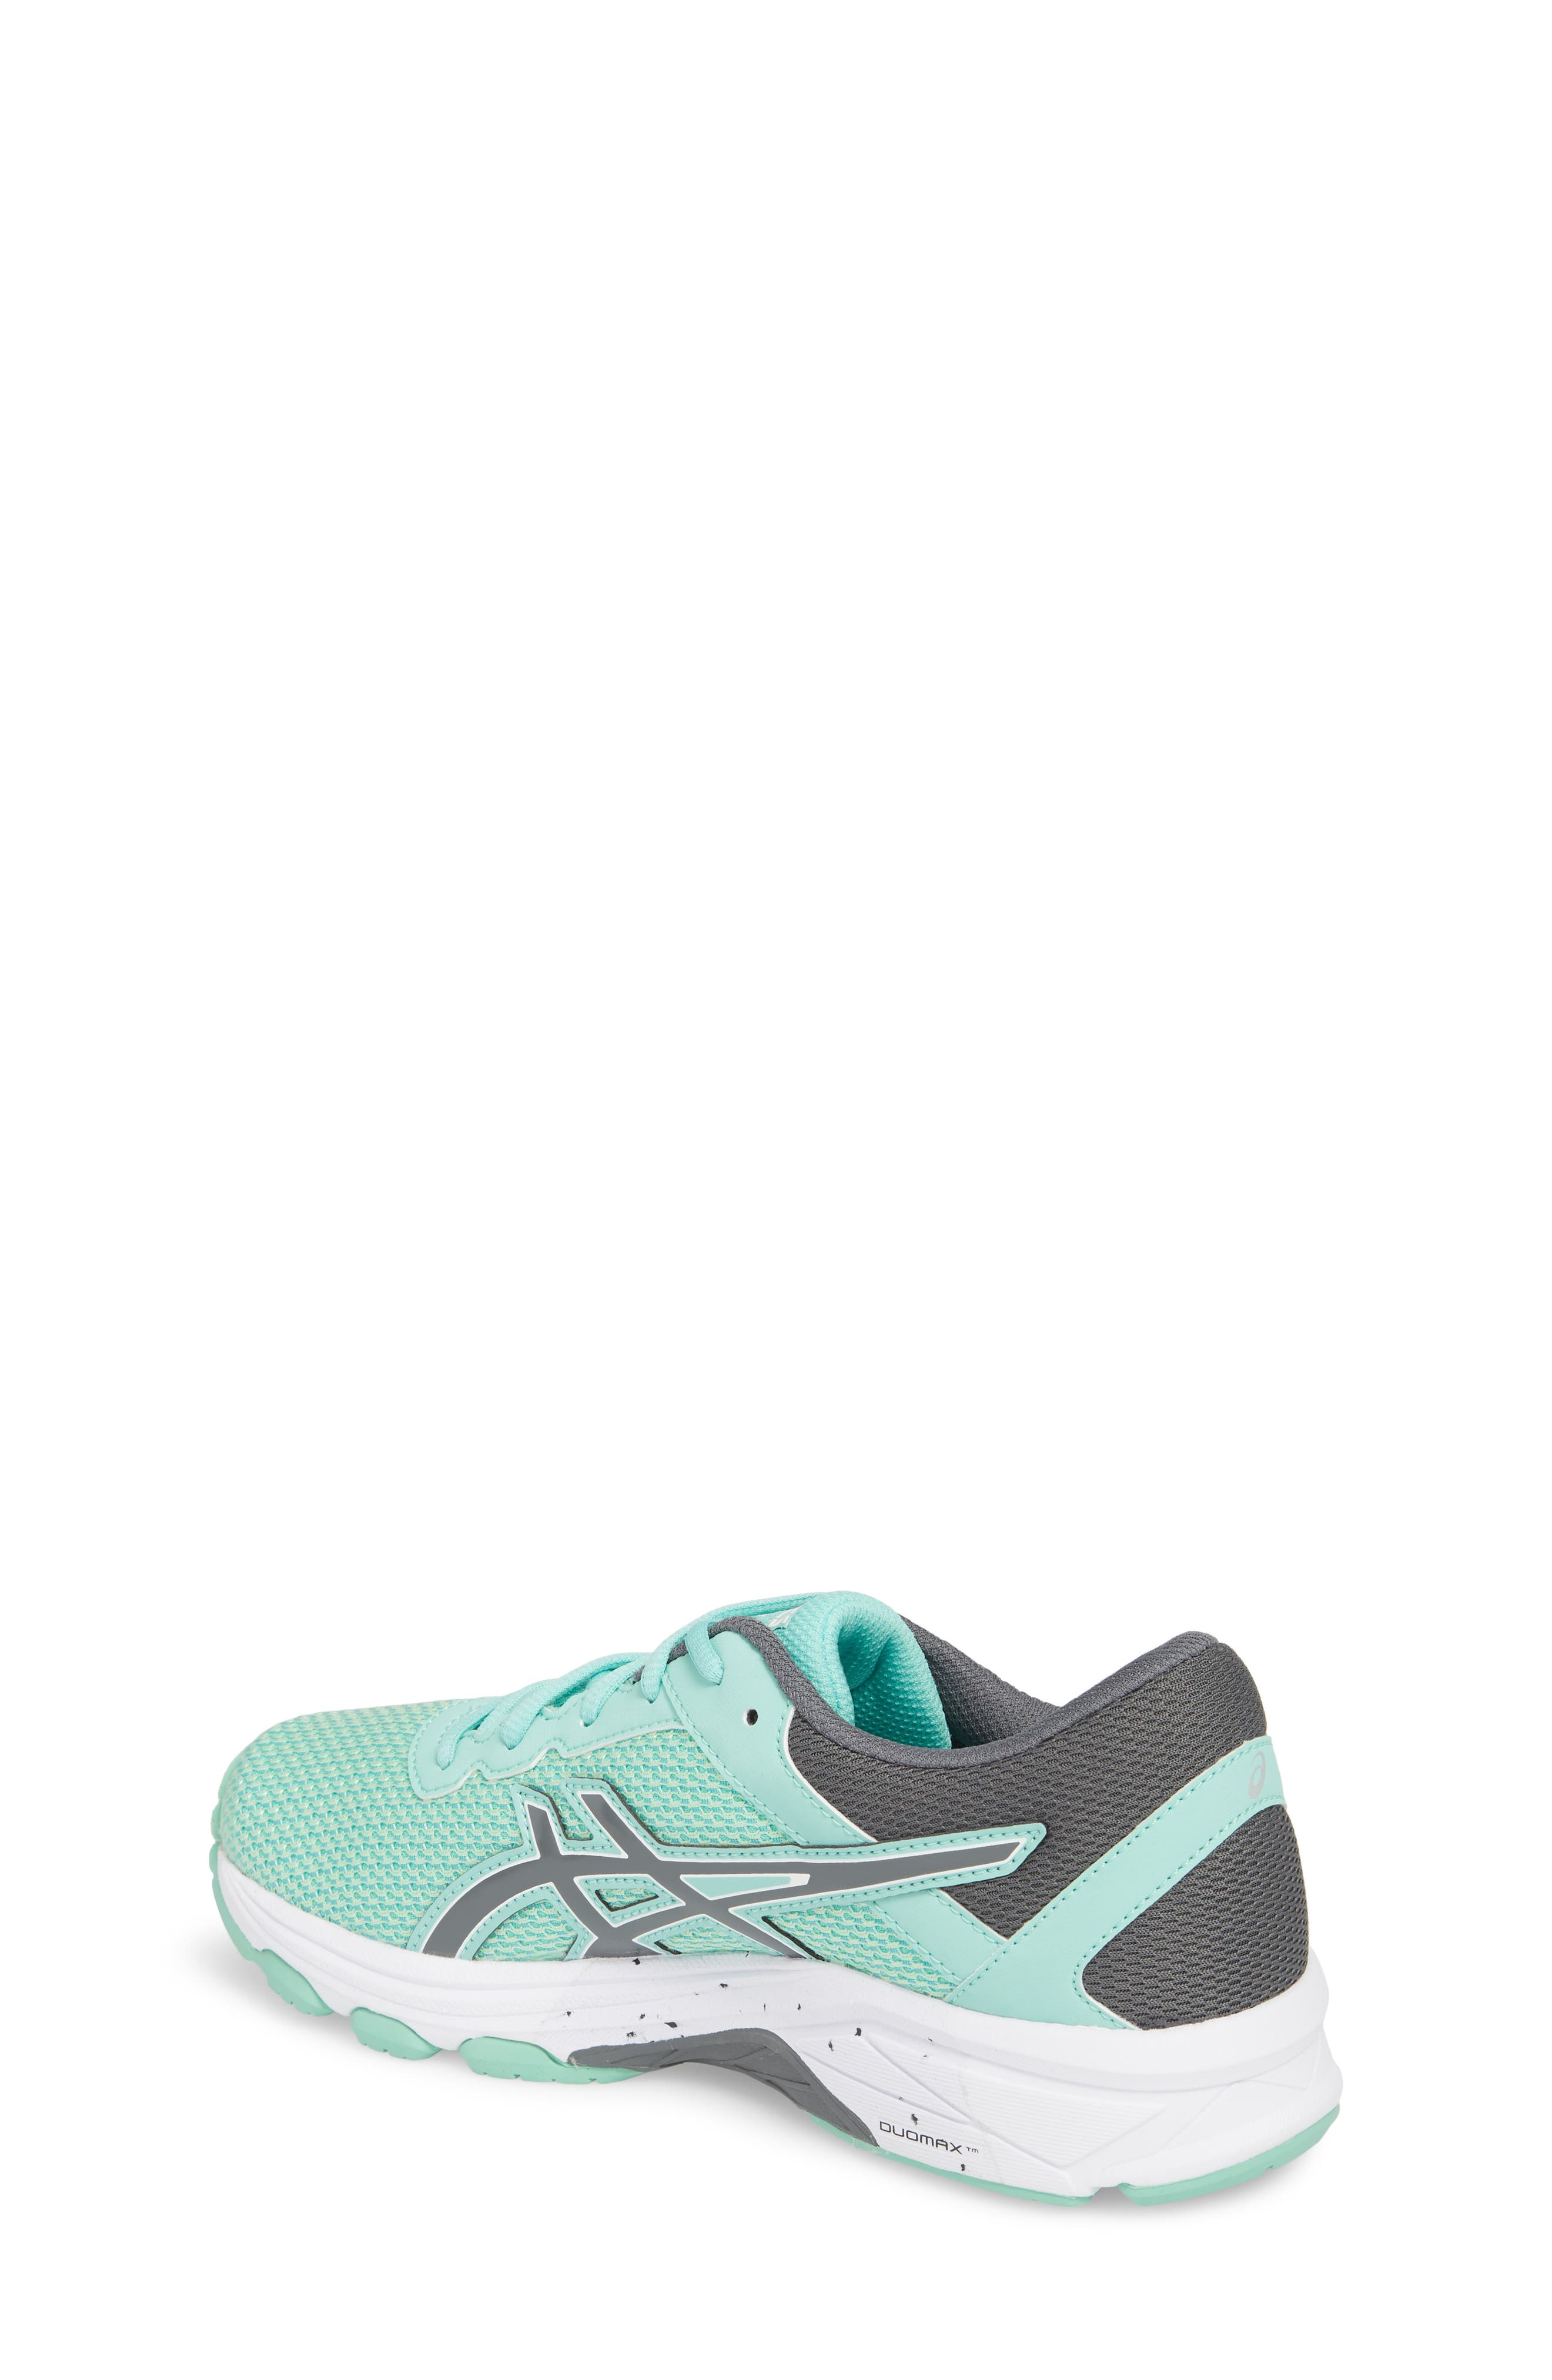 Asics GT-1000<sup>™</sup> 6 GS Sneaker,                             Alternate thumbnail 2, color,                             Carbon/ Opal Green